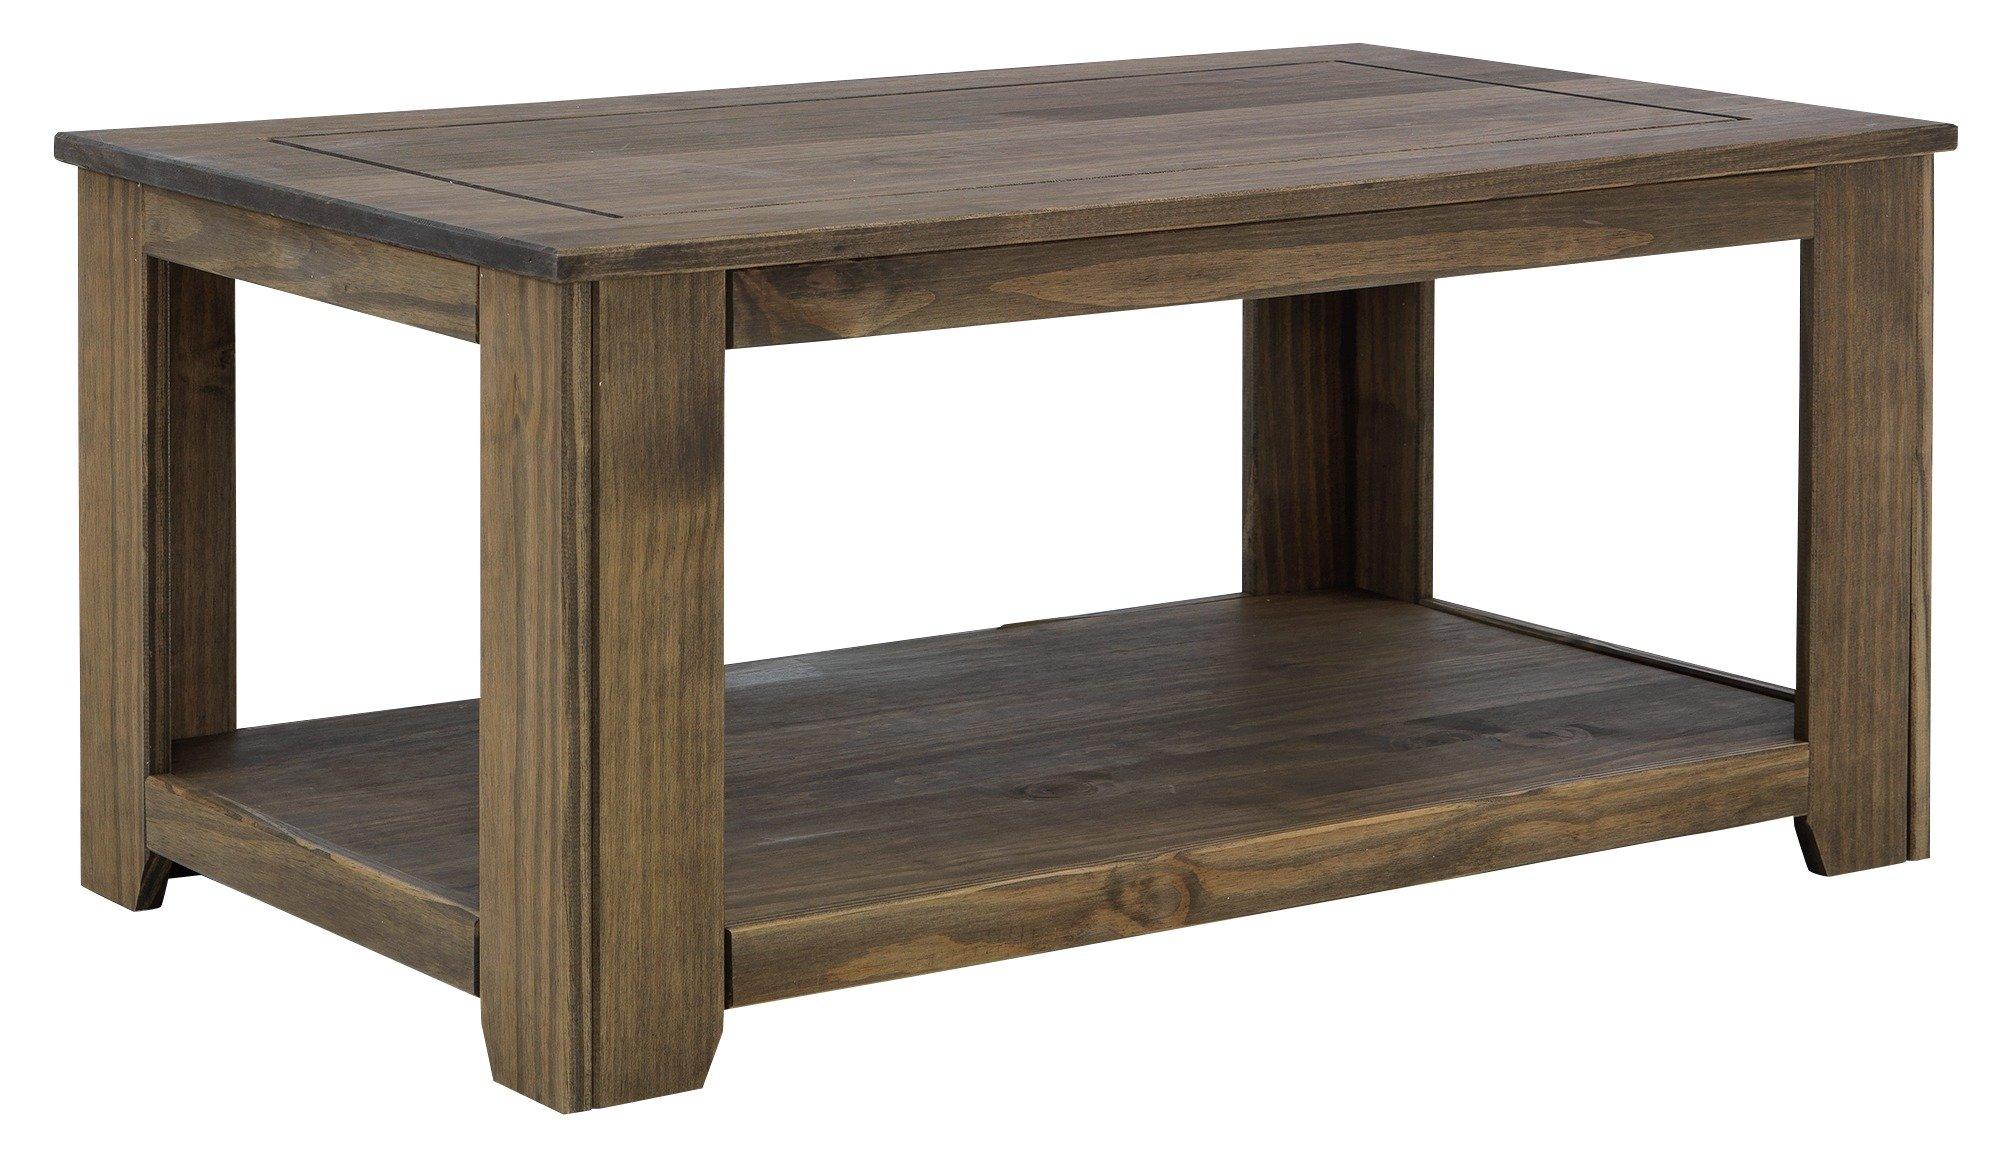 Argos Home Amersham Solid Wood Coffee Table - Dark Pine